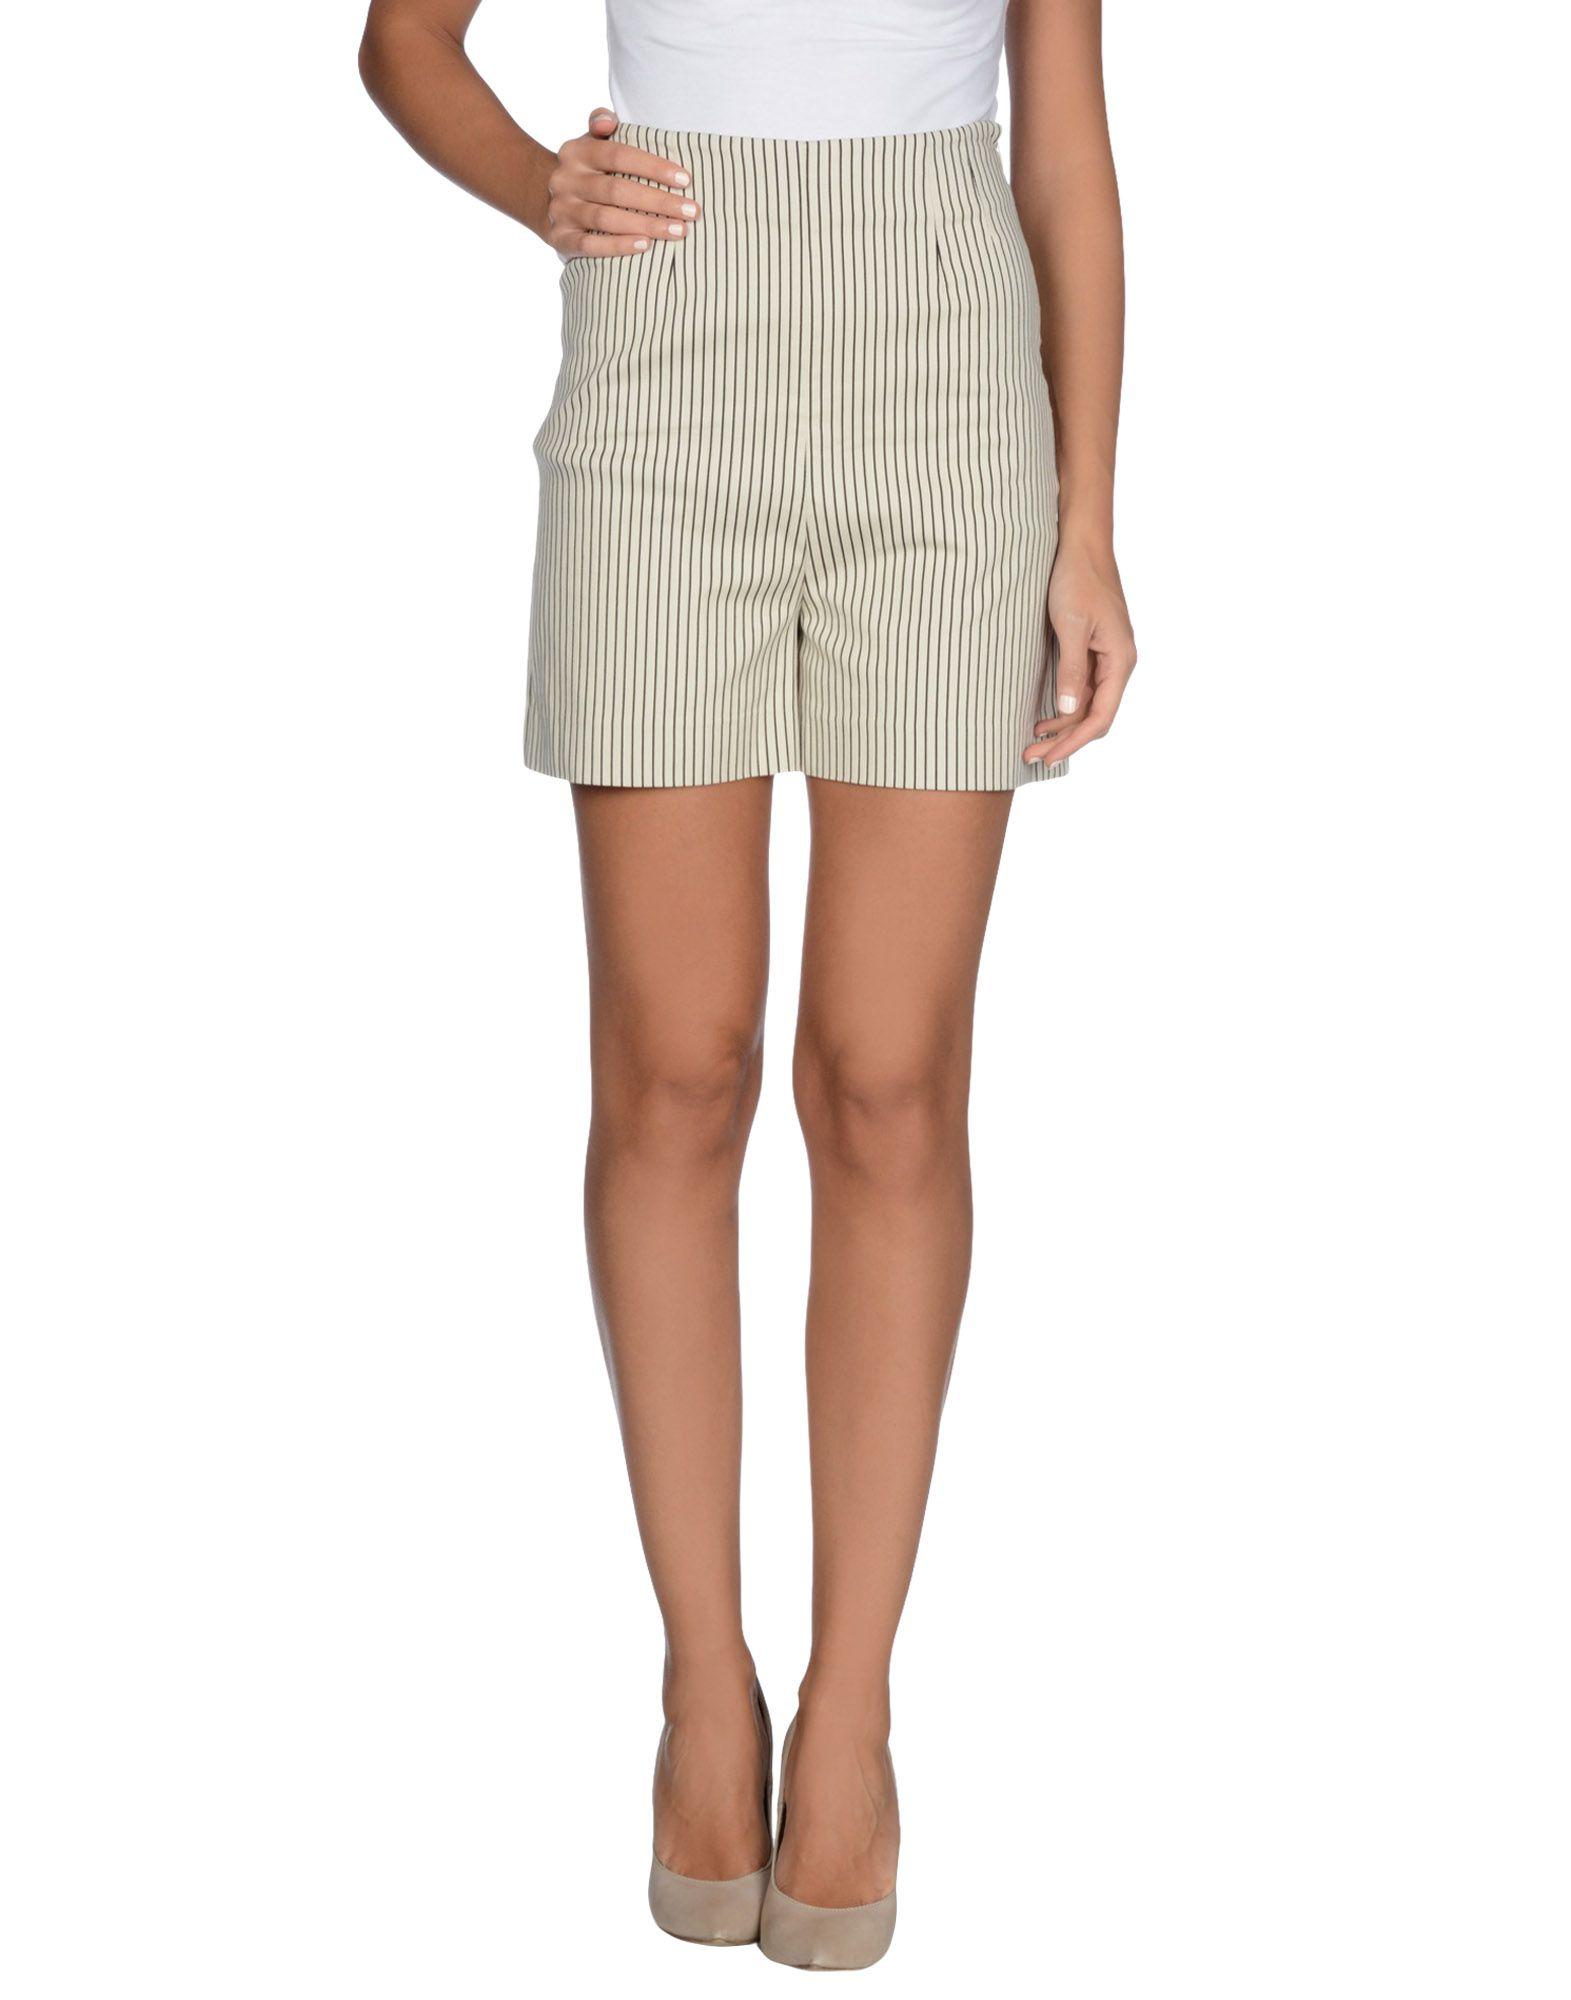 PAOLO ERRICO Damen Shorts Farbe Beige Größe 3